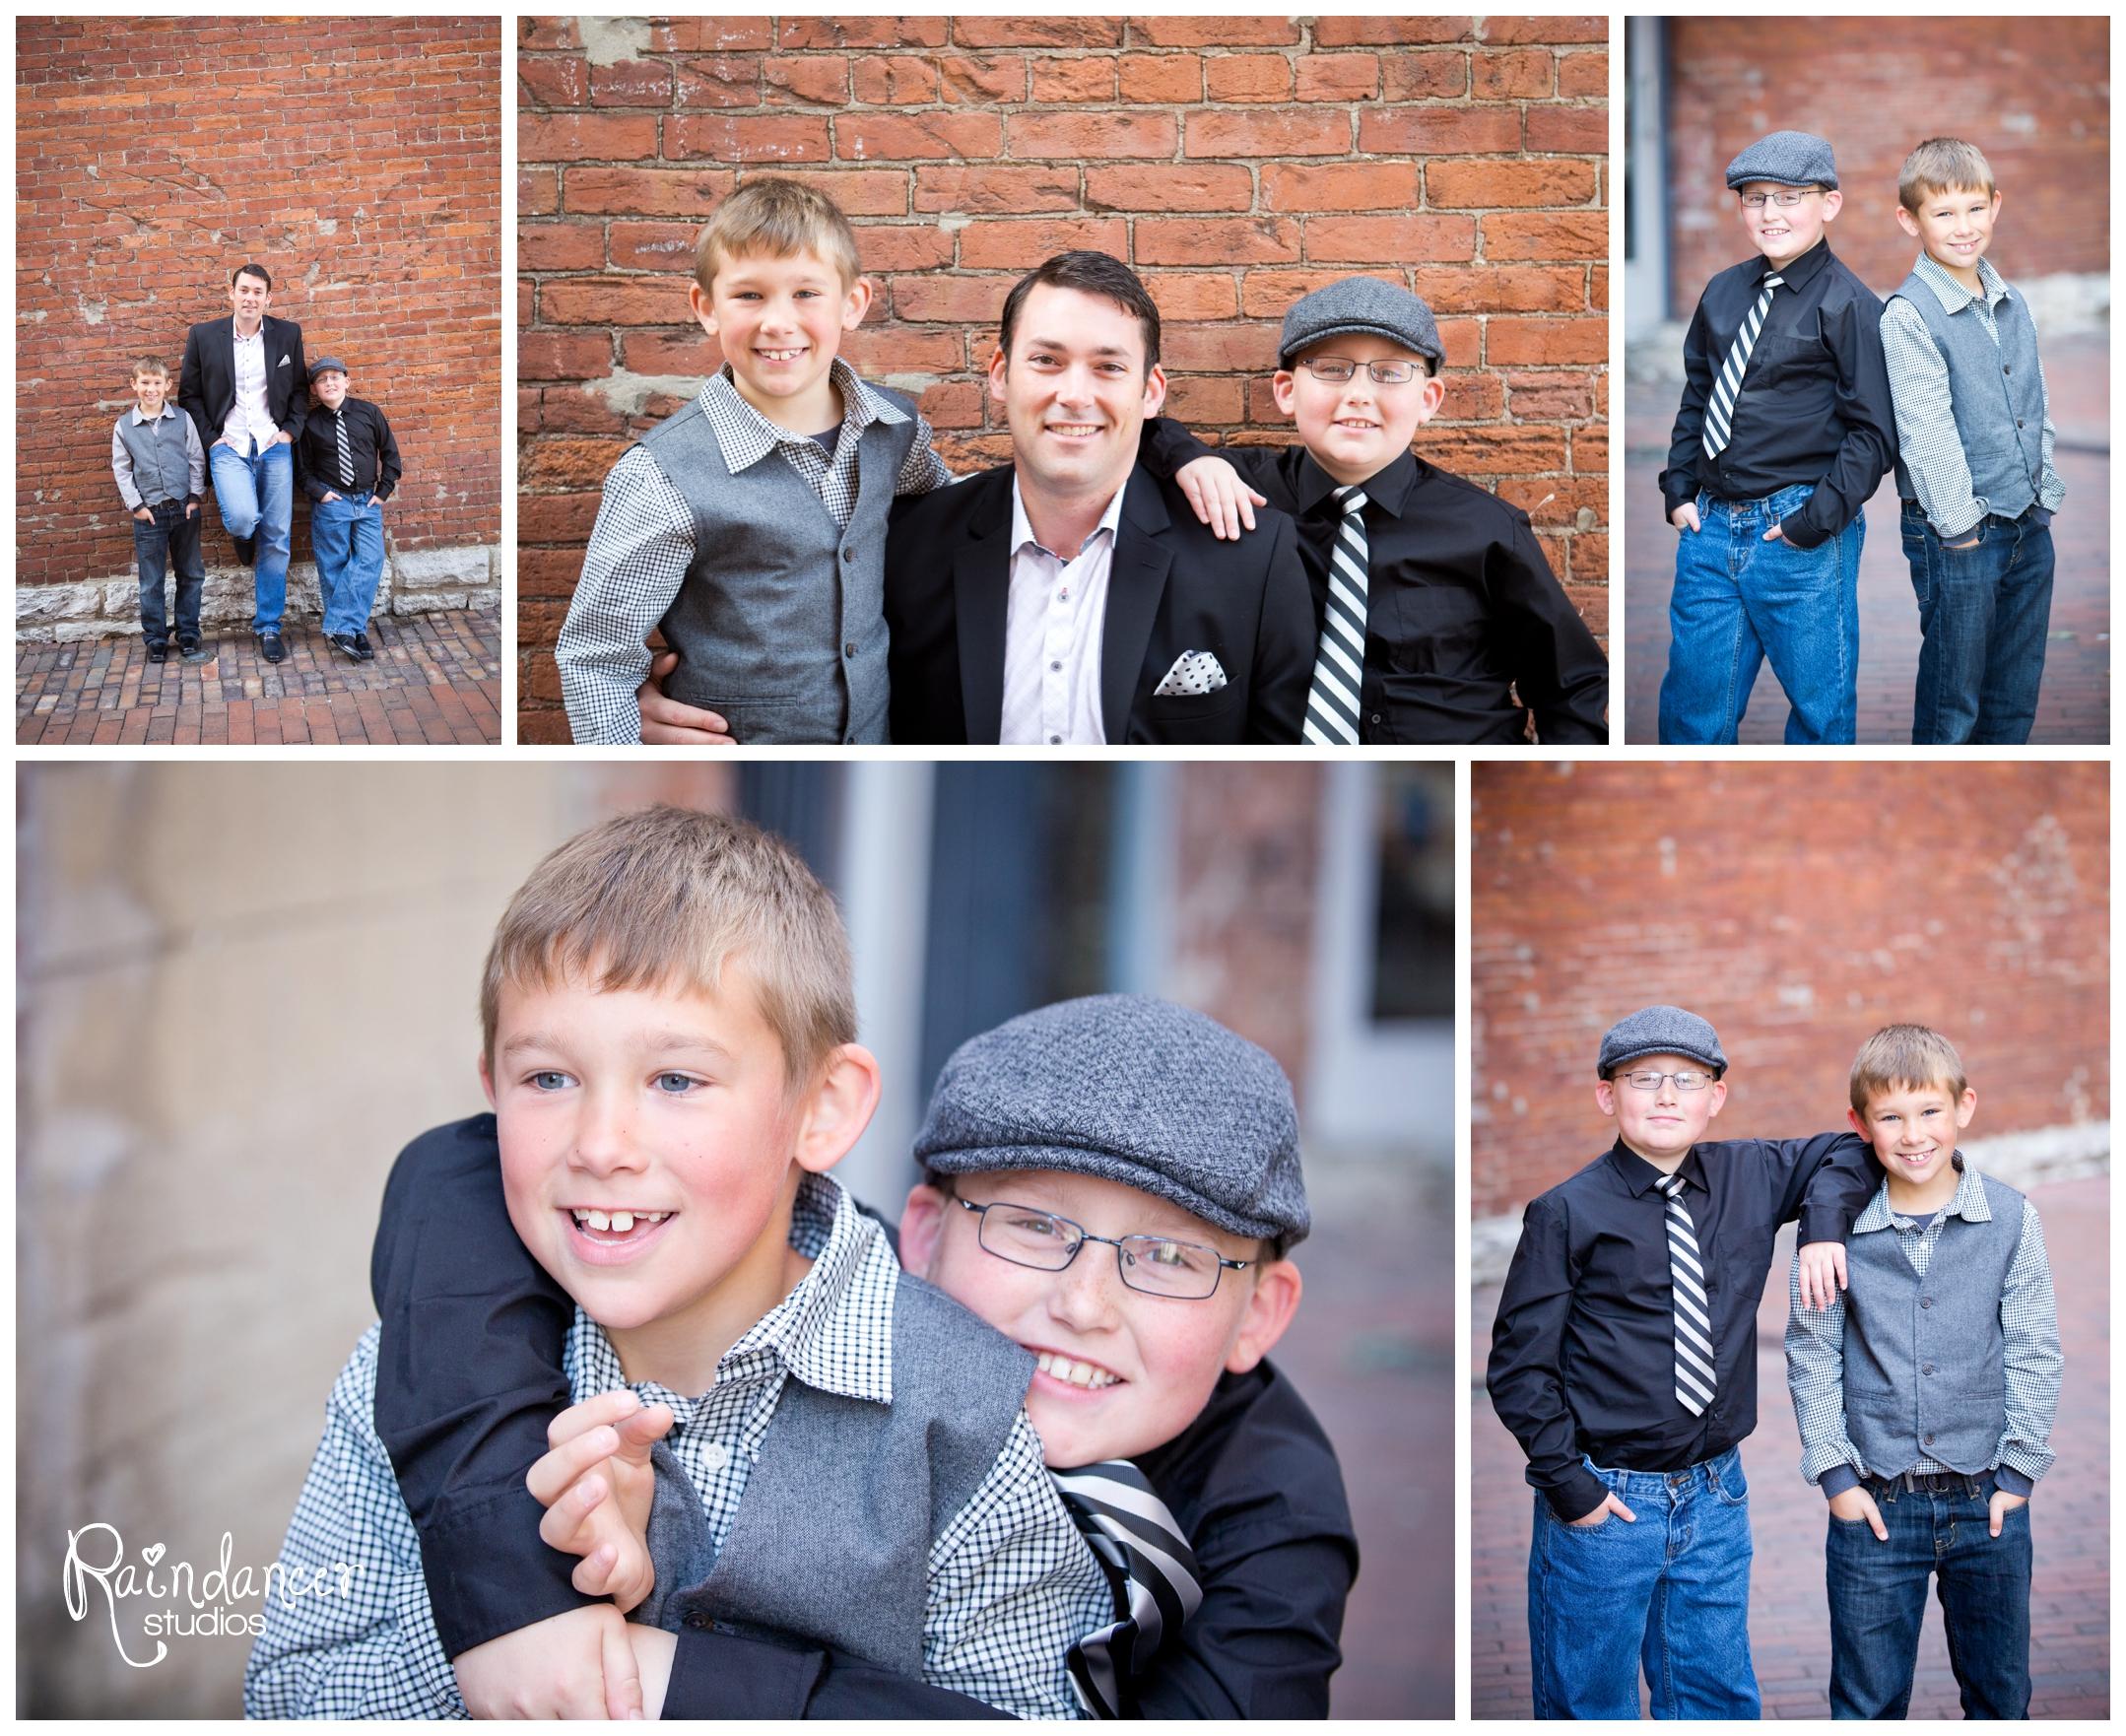 Indianpolis Family Photographer, Indianapolis Children Photographer, Greenwood Family Photographer